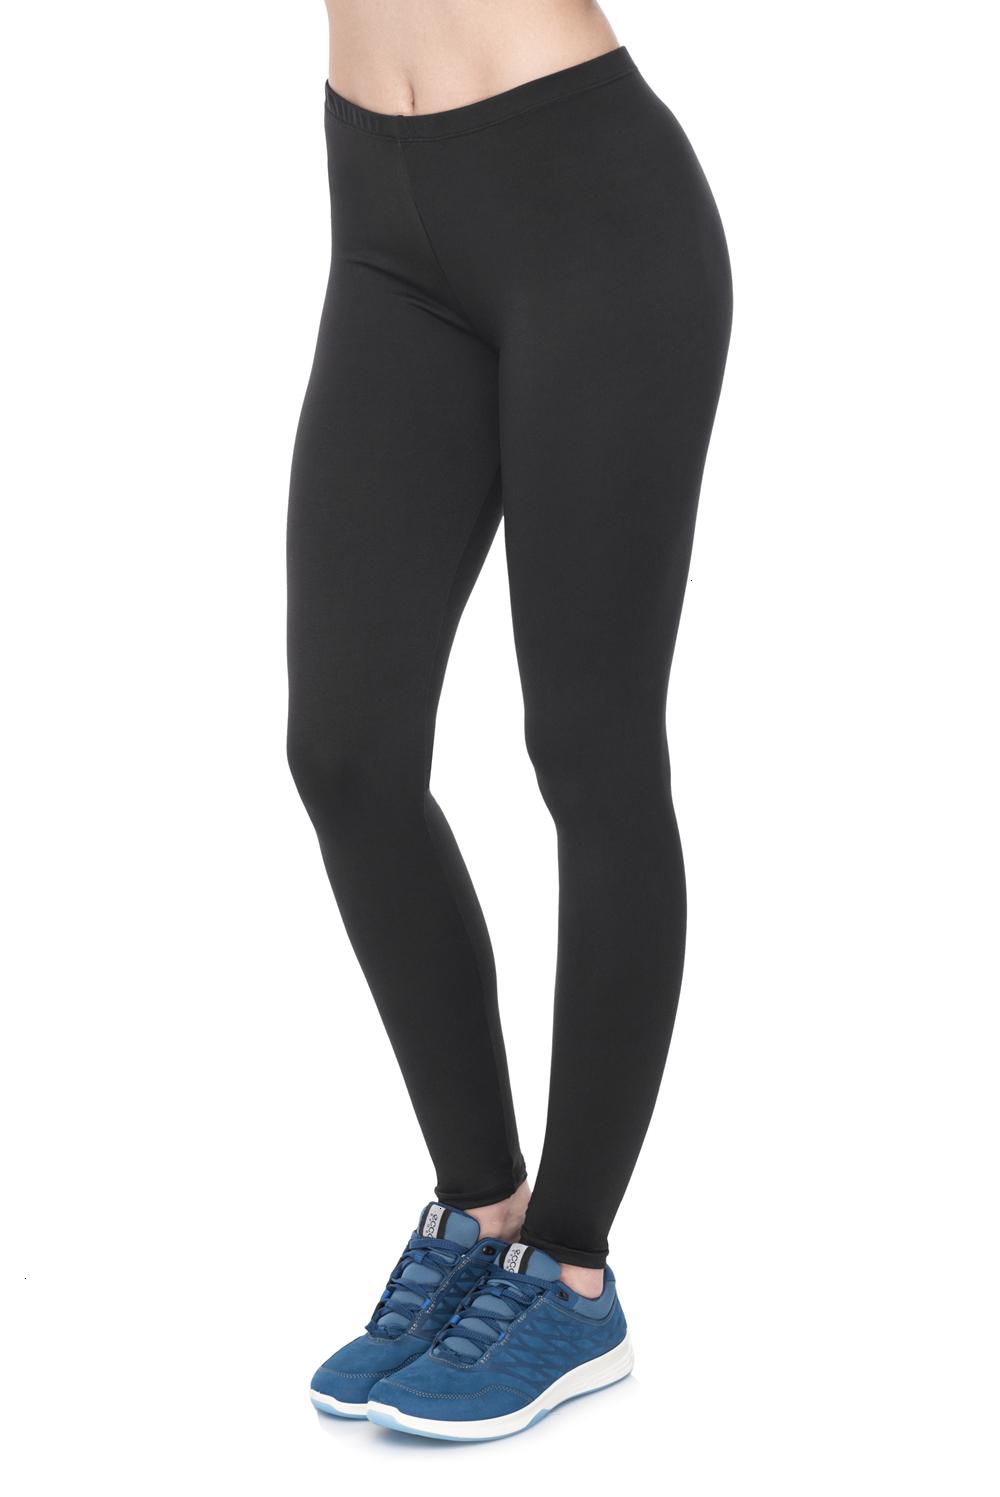 lgb00003 Basic leggings black fashion style (21)